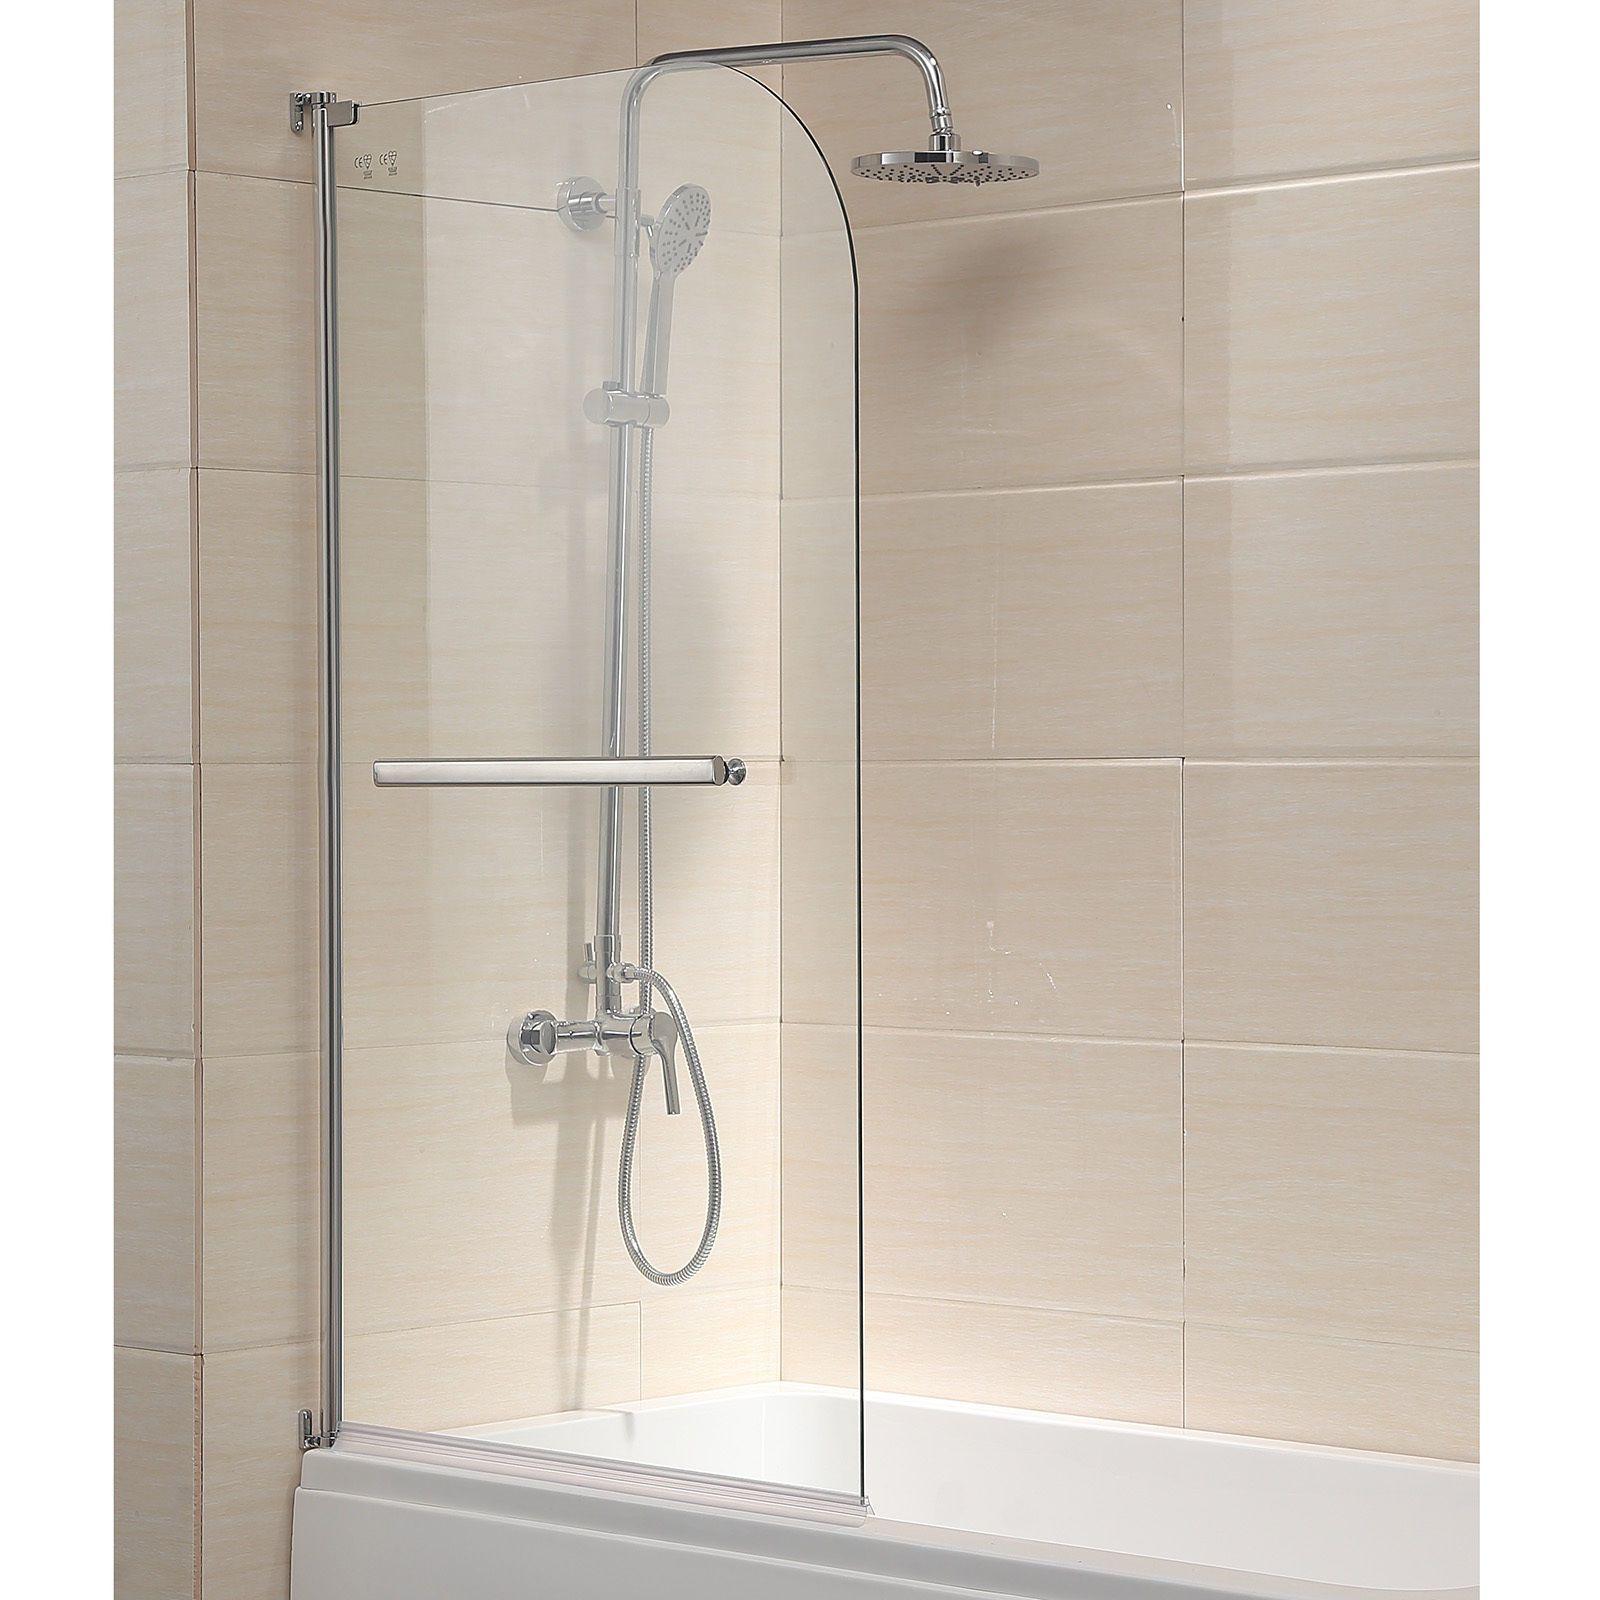 55 X31 Pivot Bath Tub Shower Door Panel Framless 1 4 Clear Glass Chrome Finish Shower Doors Bathtub Shower Doors Bath Shower Doors